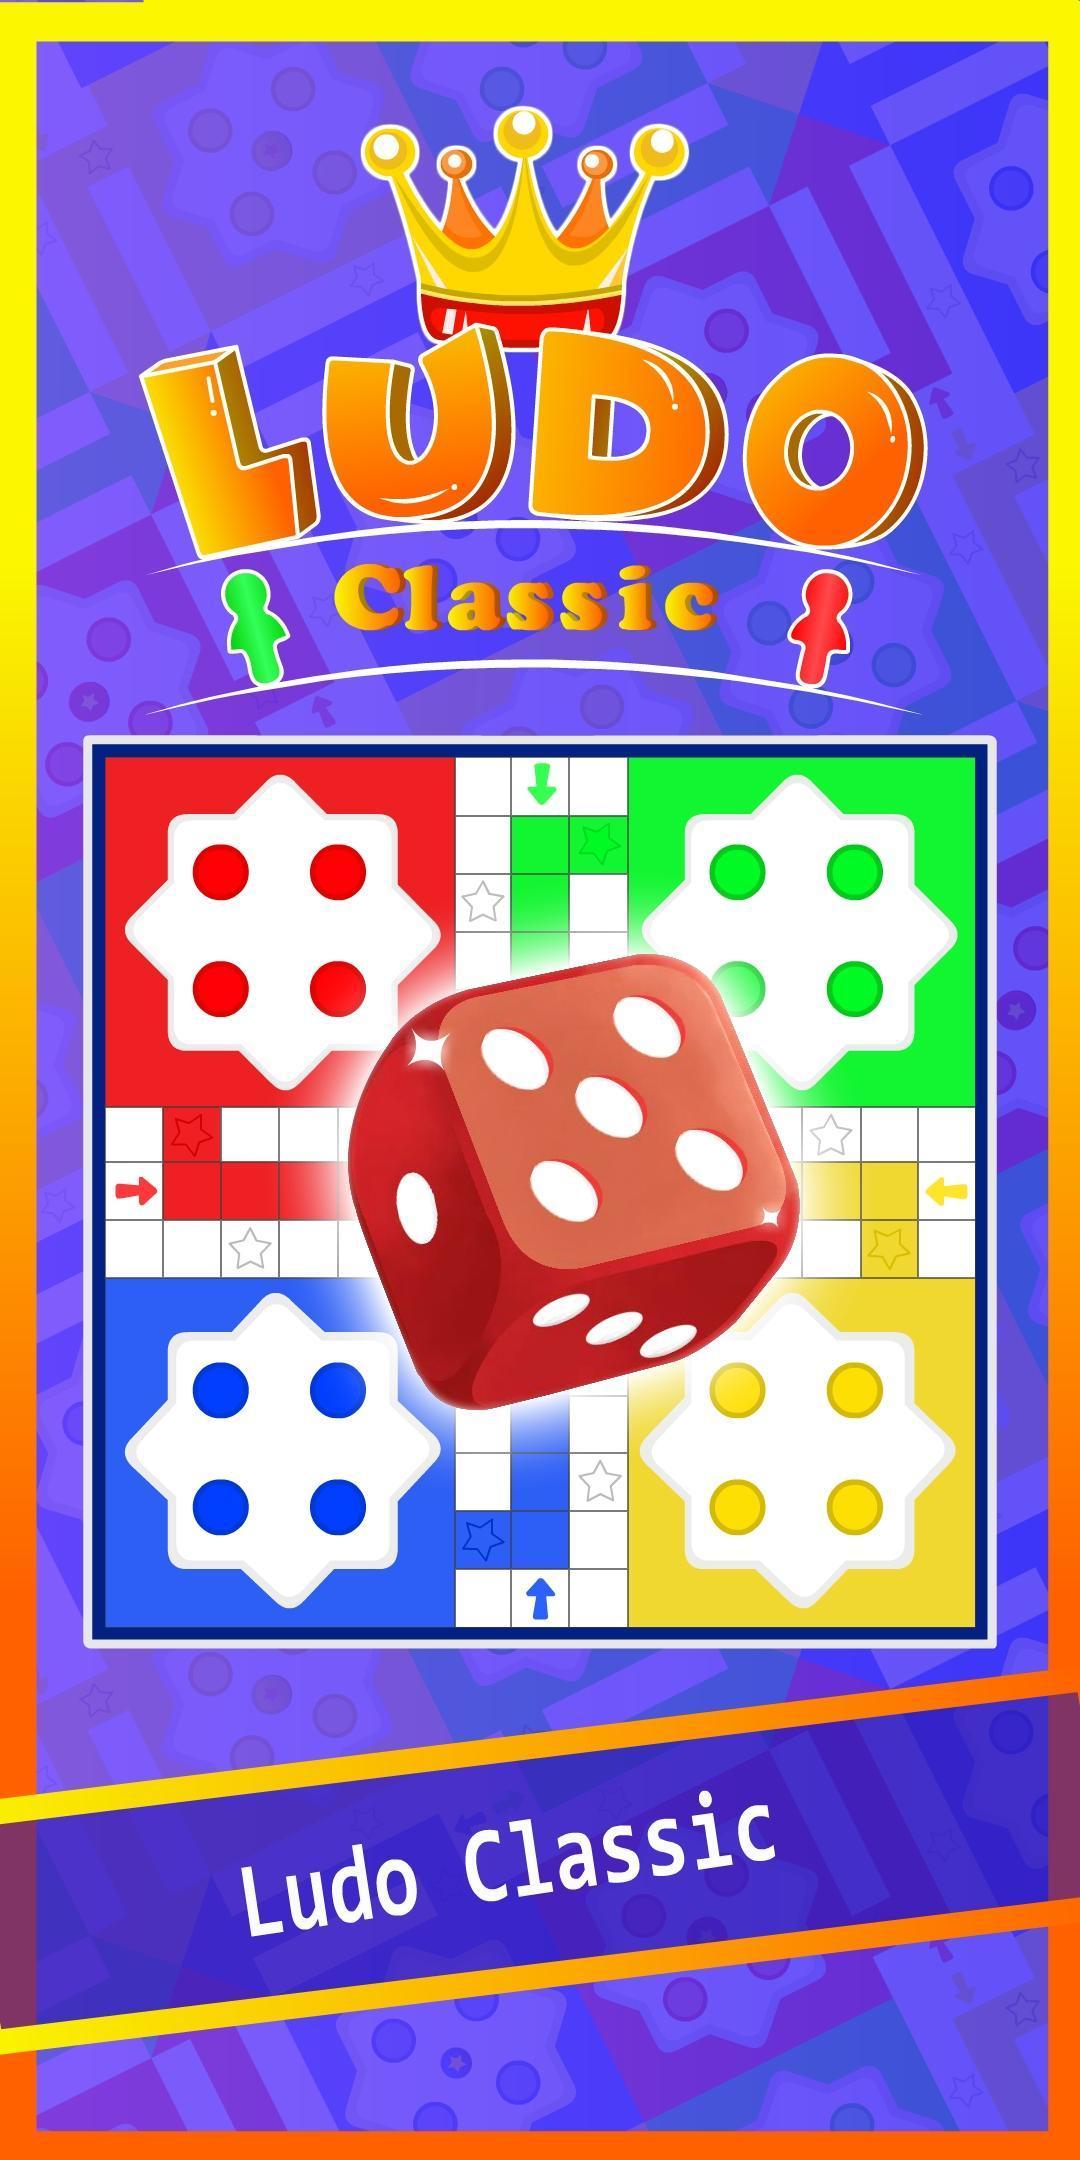 Ludo Club - Ludo Classic - King of Board Games 👑 1.5 Screenshot 6